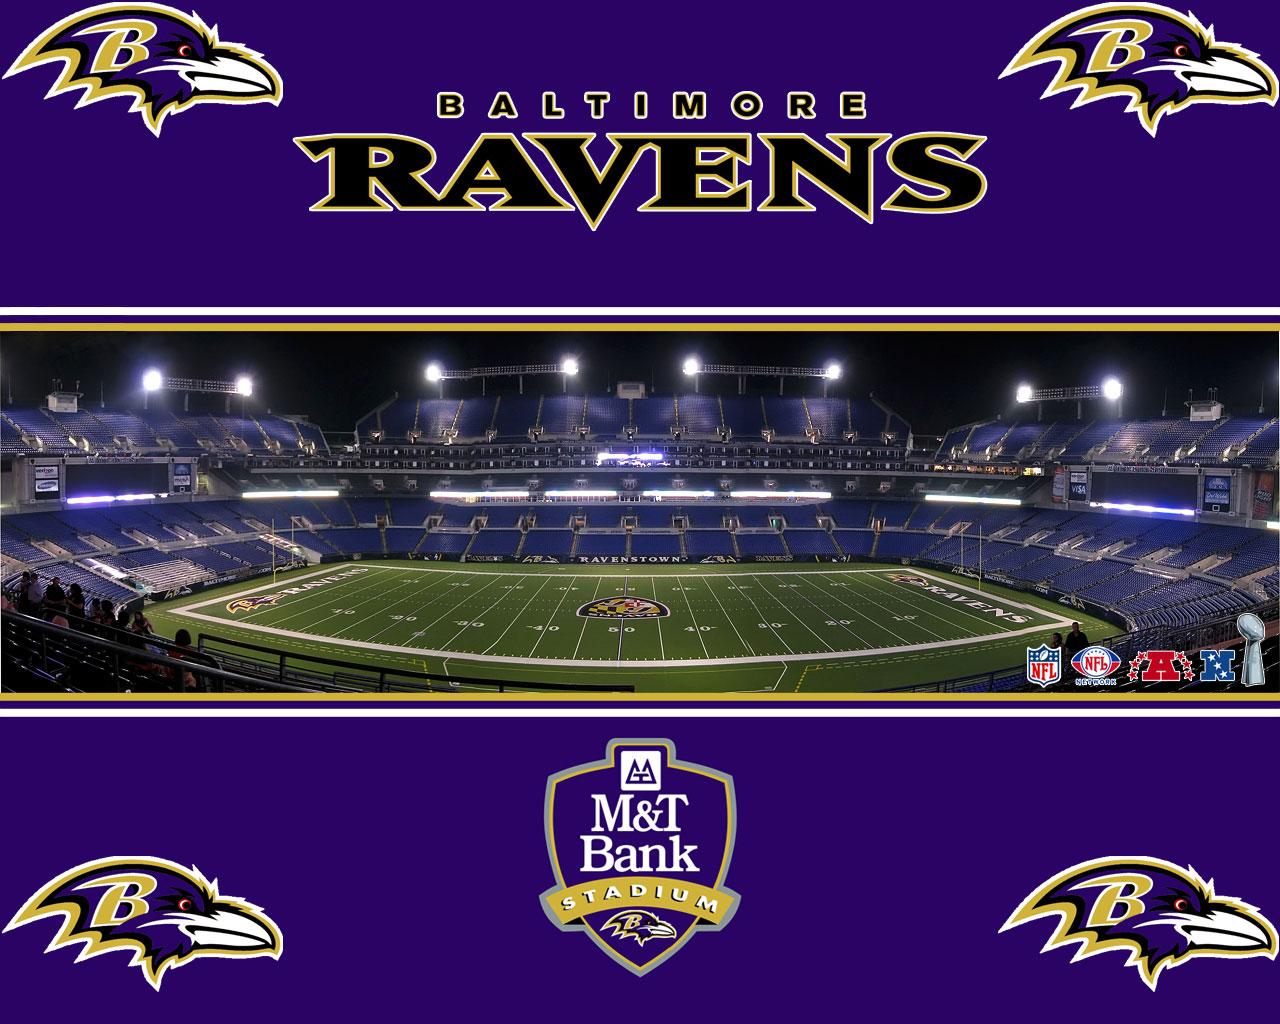 Baltimore Ravens HD wallpaper Baltimore Ravens wallpapers 1280x1024